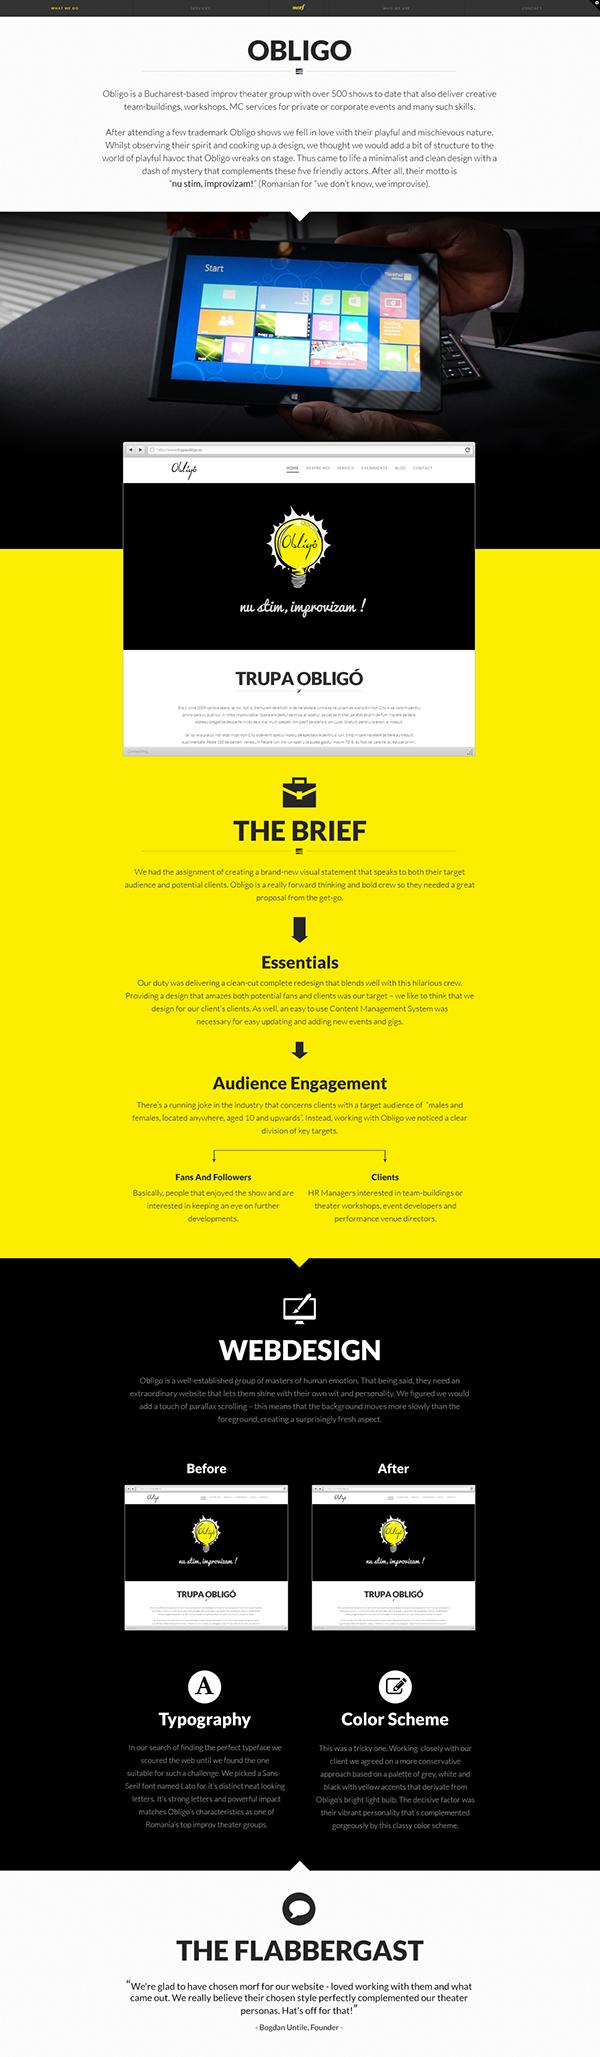 Webdesign redesign theater